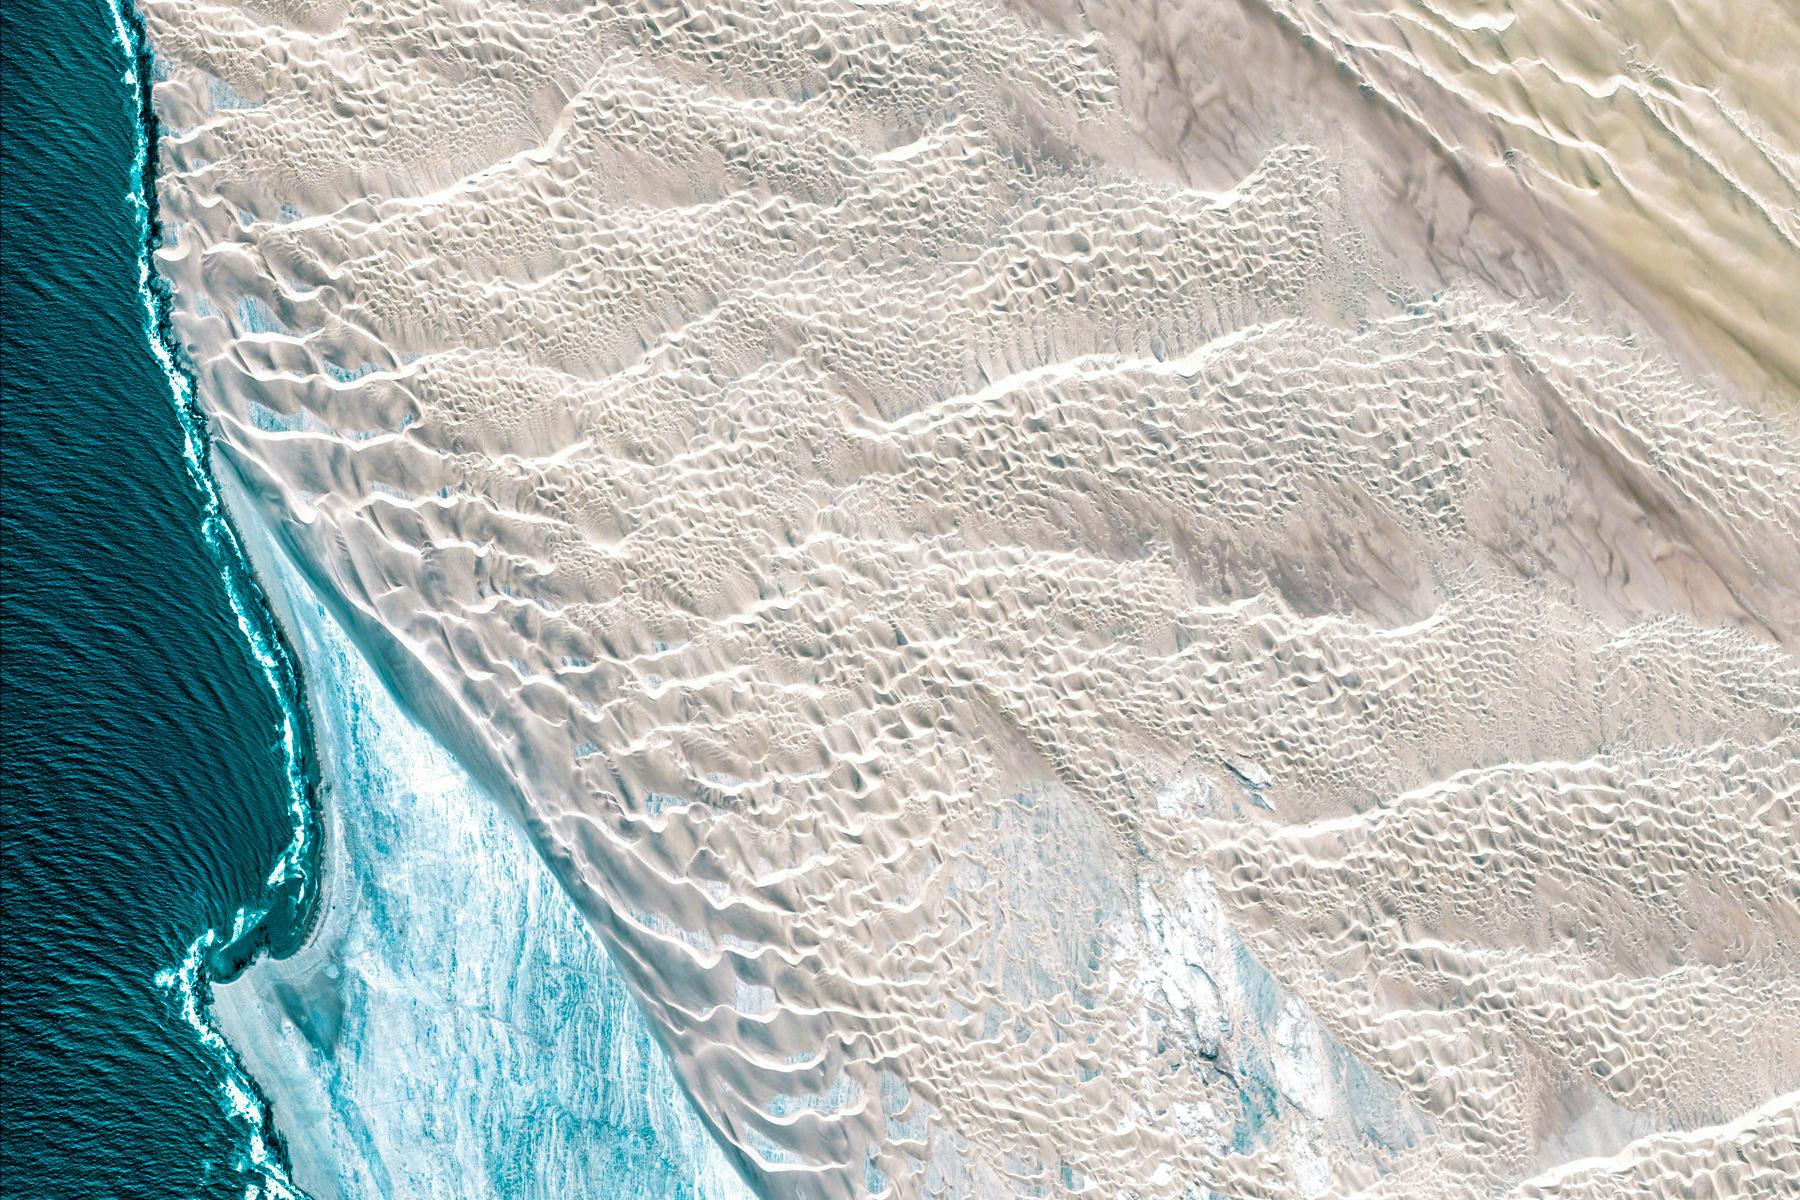 google-earth-Namibia-RarasRegion-14255